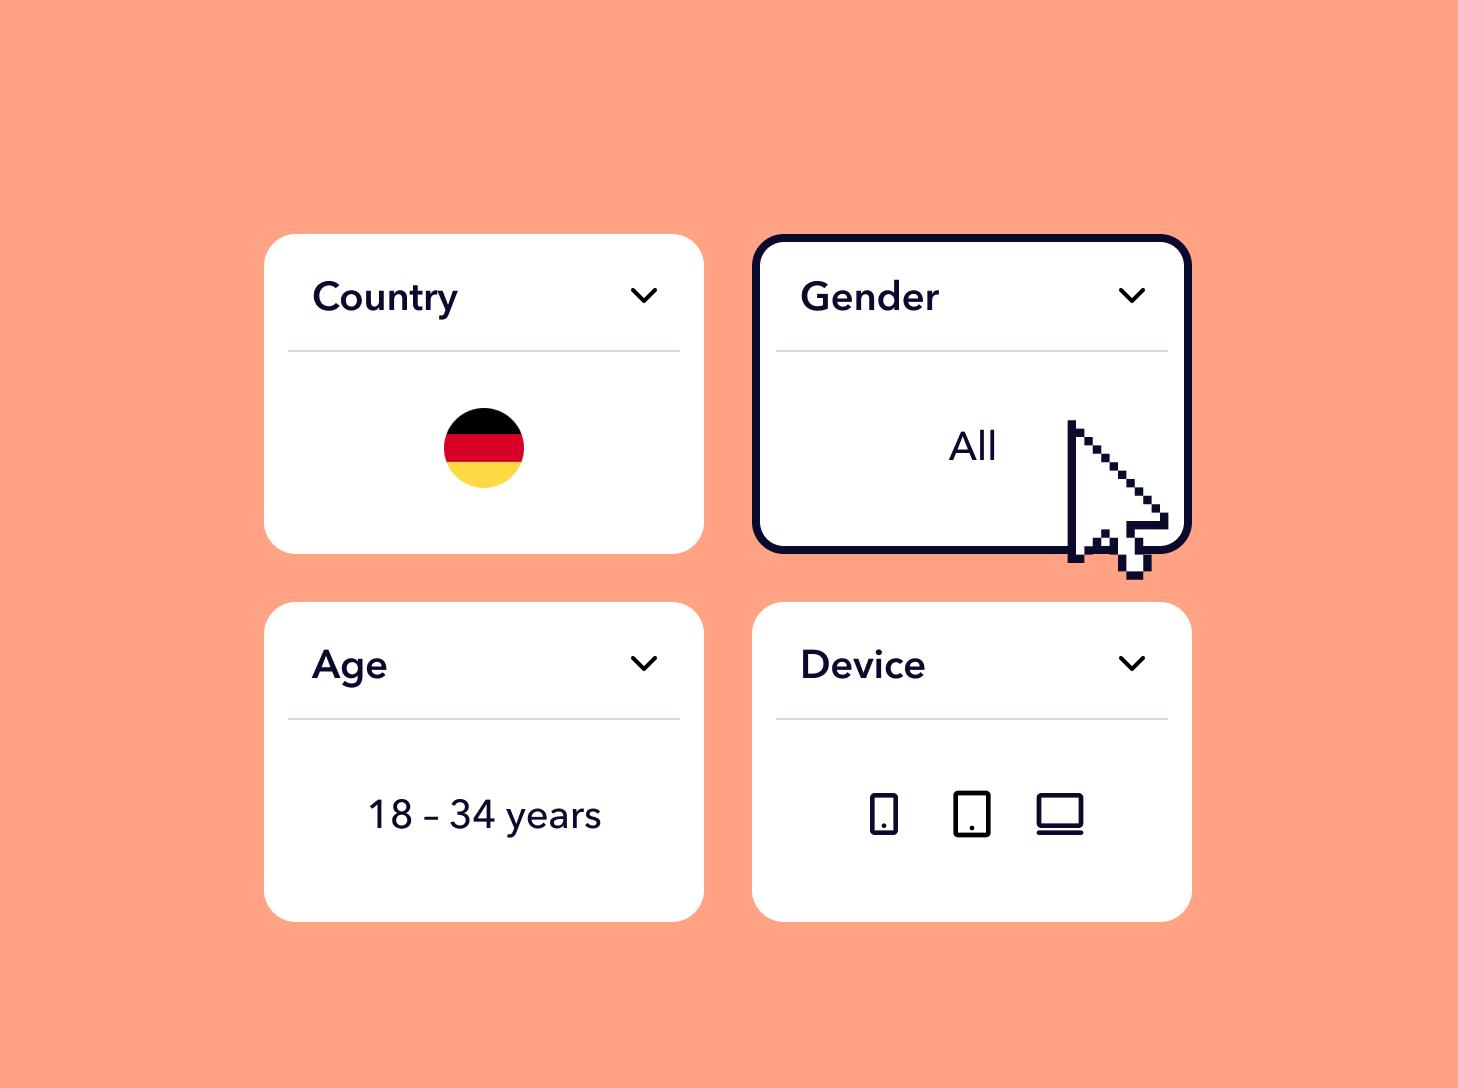 Different demographics